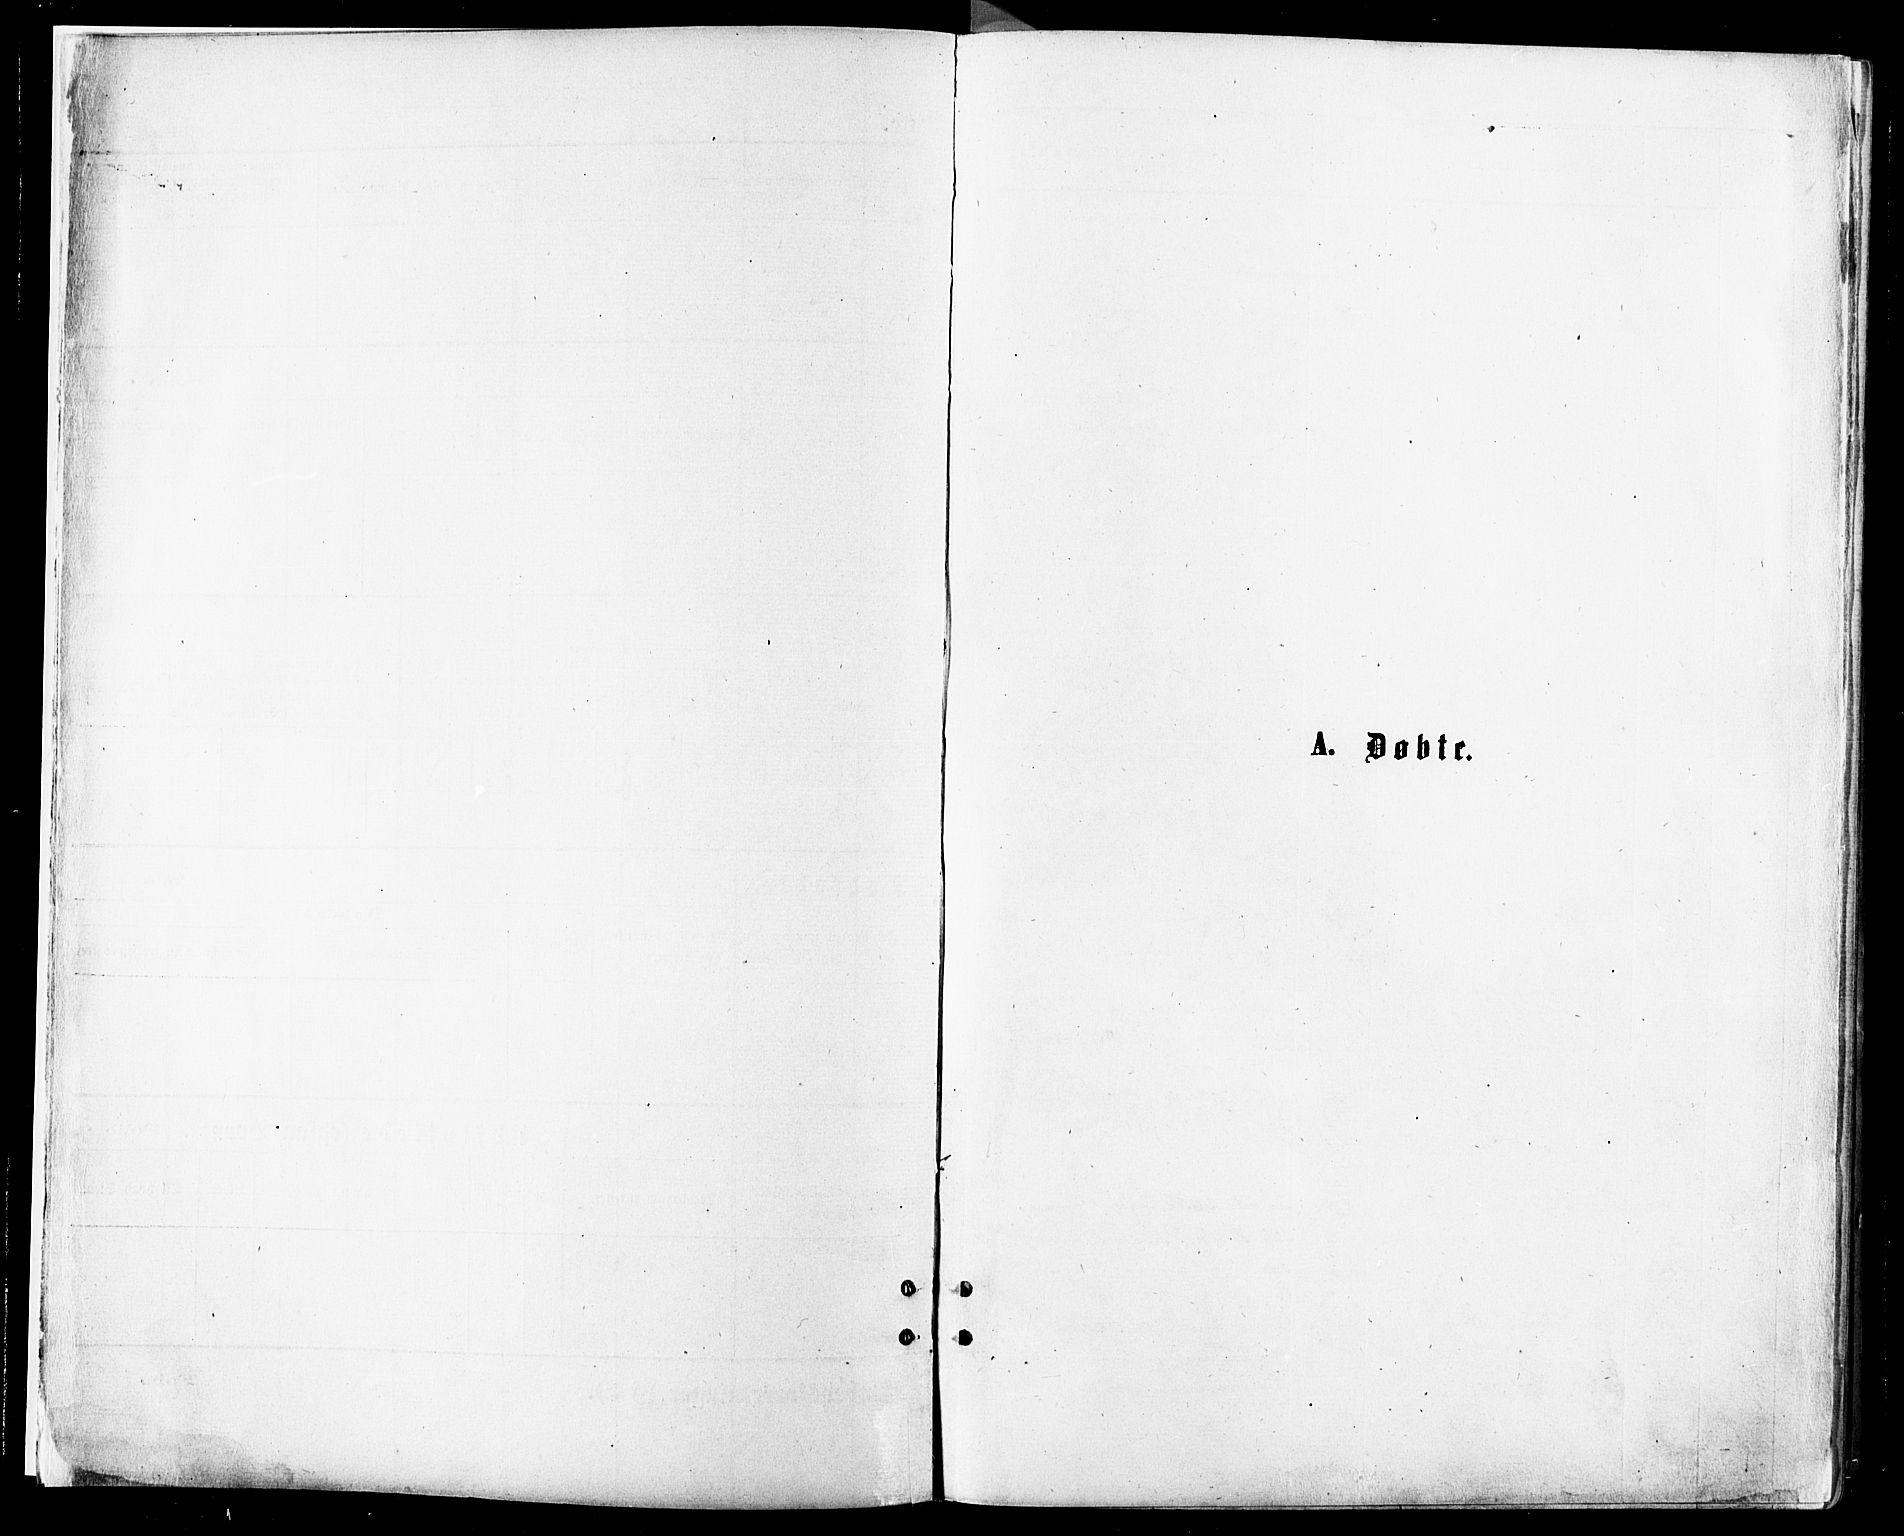 SATØ, Lenvik sokneprestembete, H/Ha: Ministerialbok nr. 10, 1873-1880